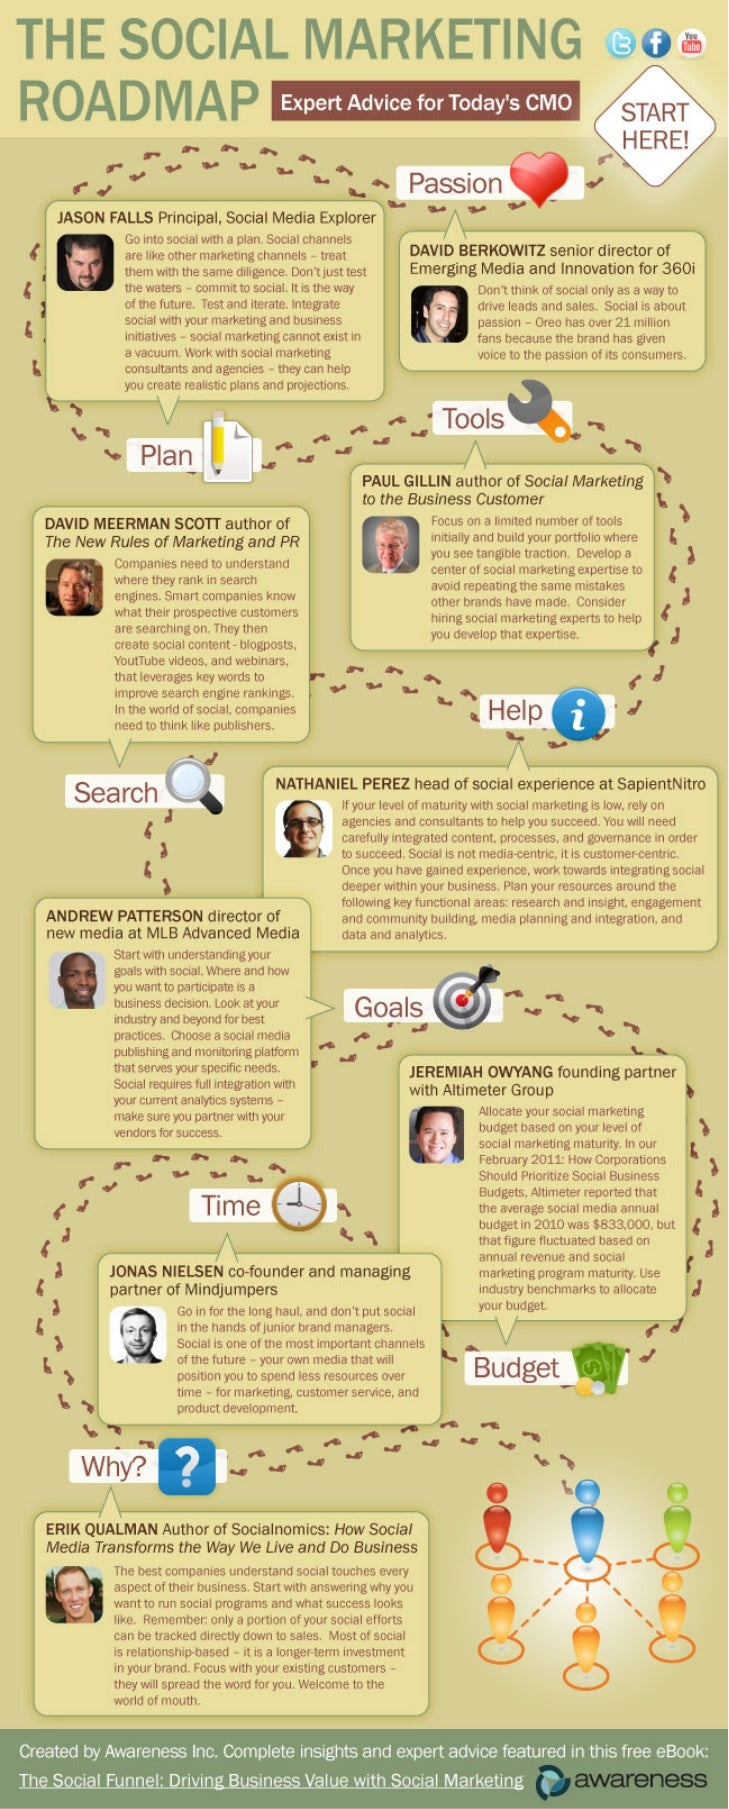 Social Marketing Roadmap [INFOGRAPHIC]